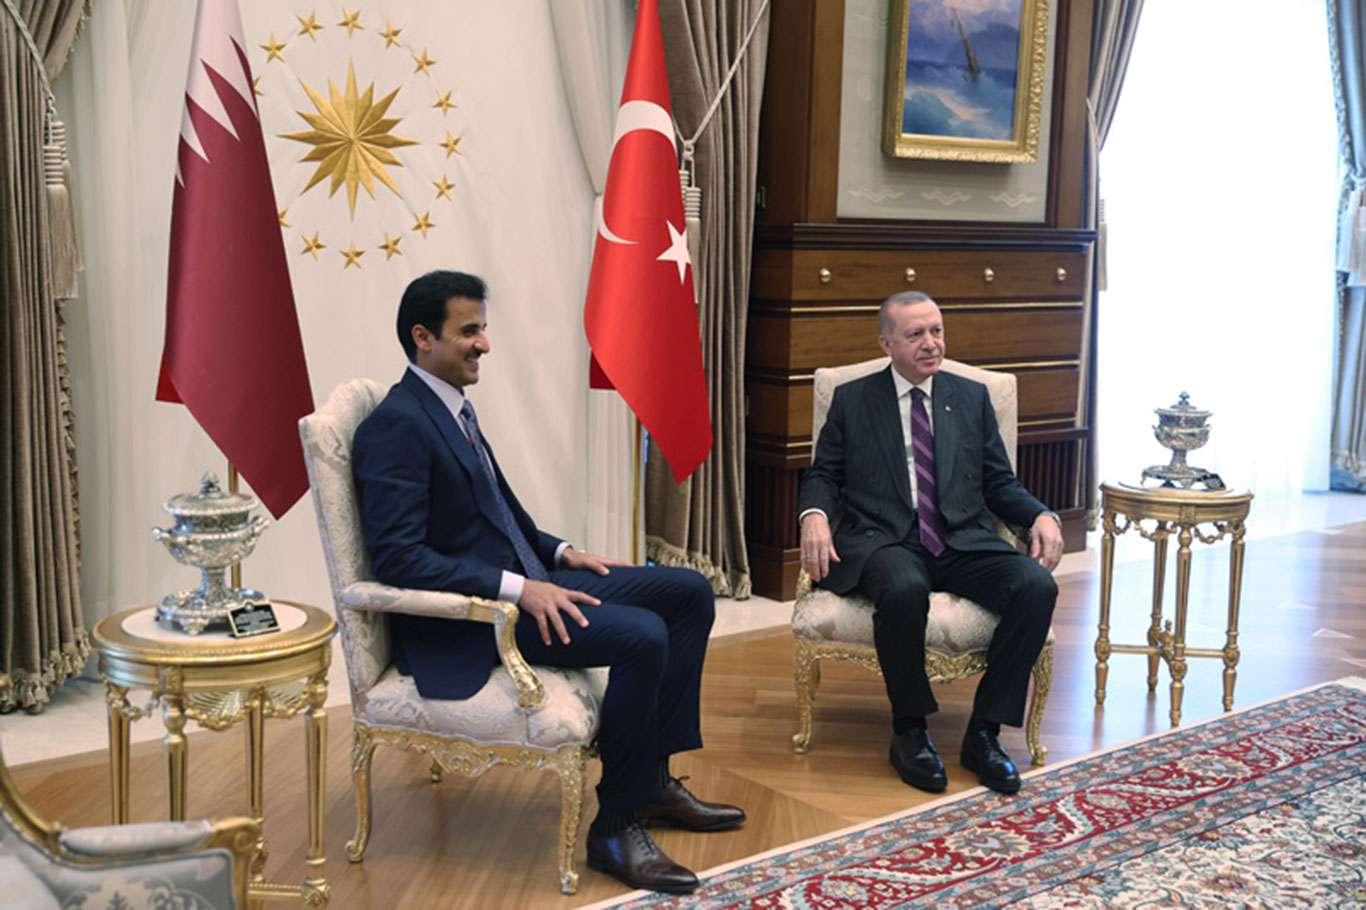 Qatar Emir Sheikh Tamim welcomed by Erdoğan at the Presidential Complex